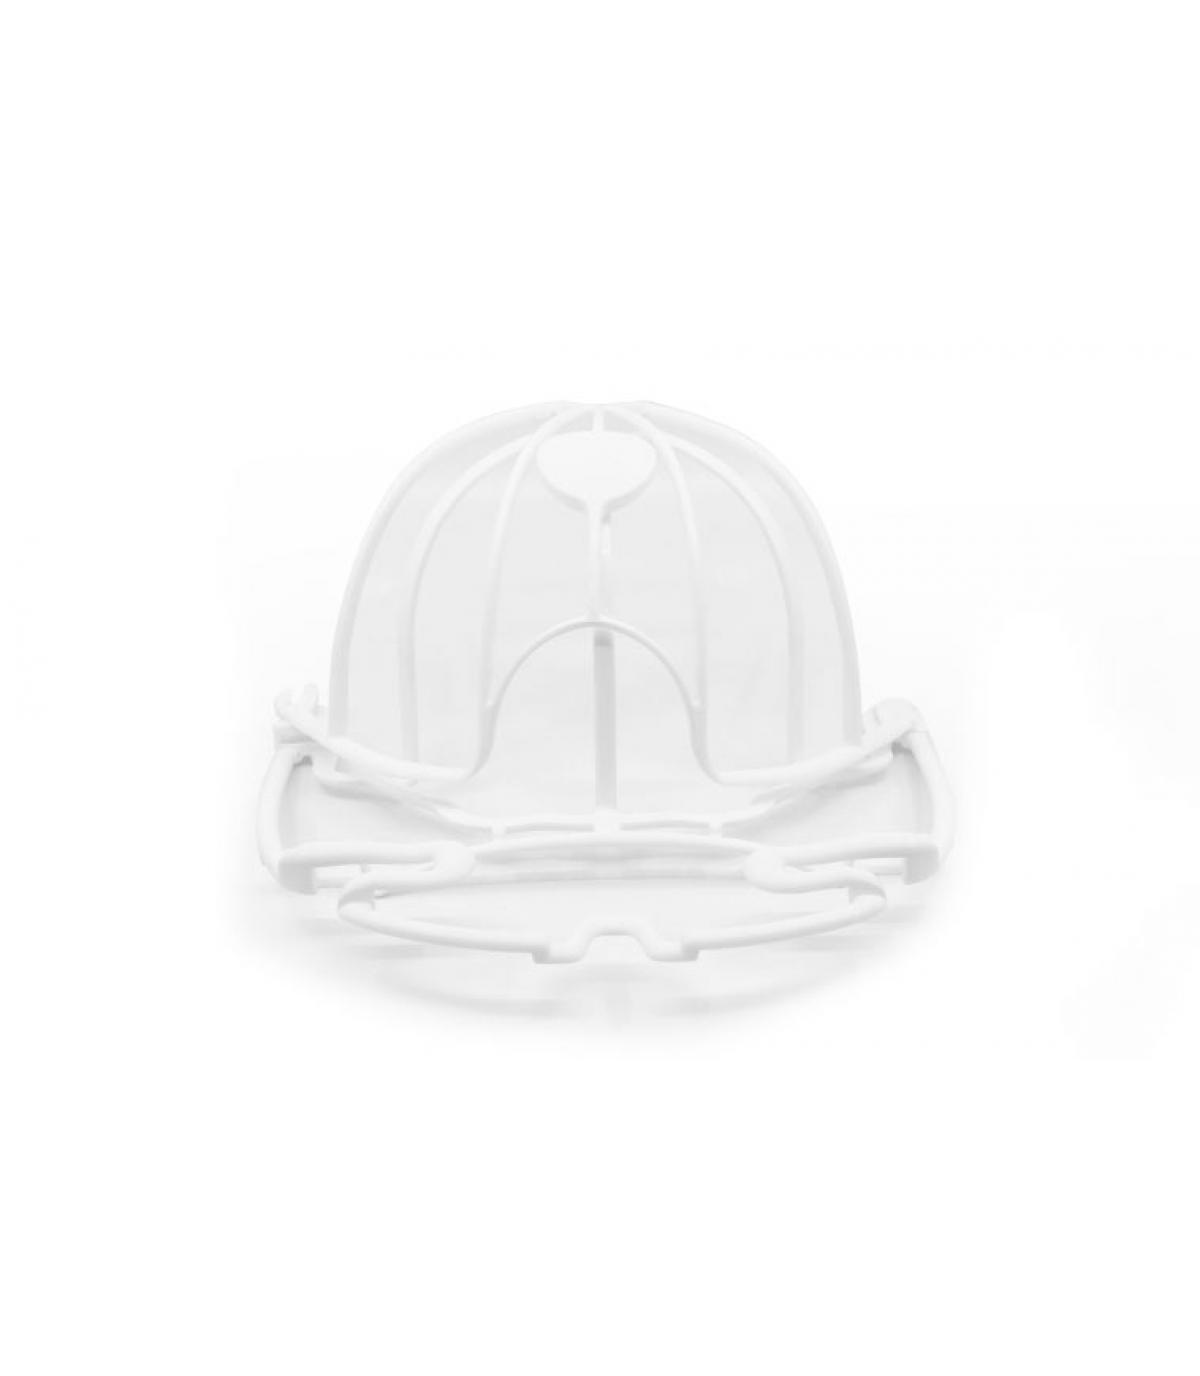 Cap Washer lave casquette